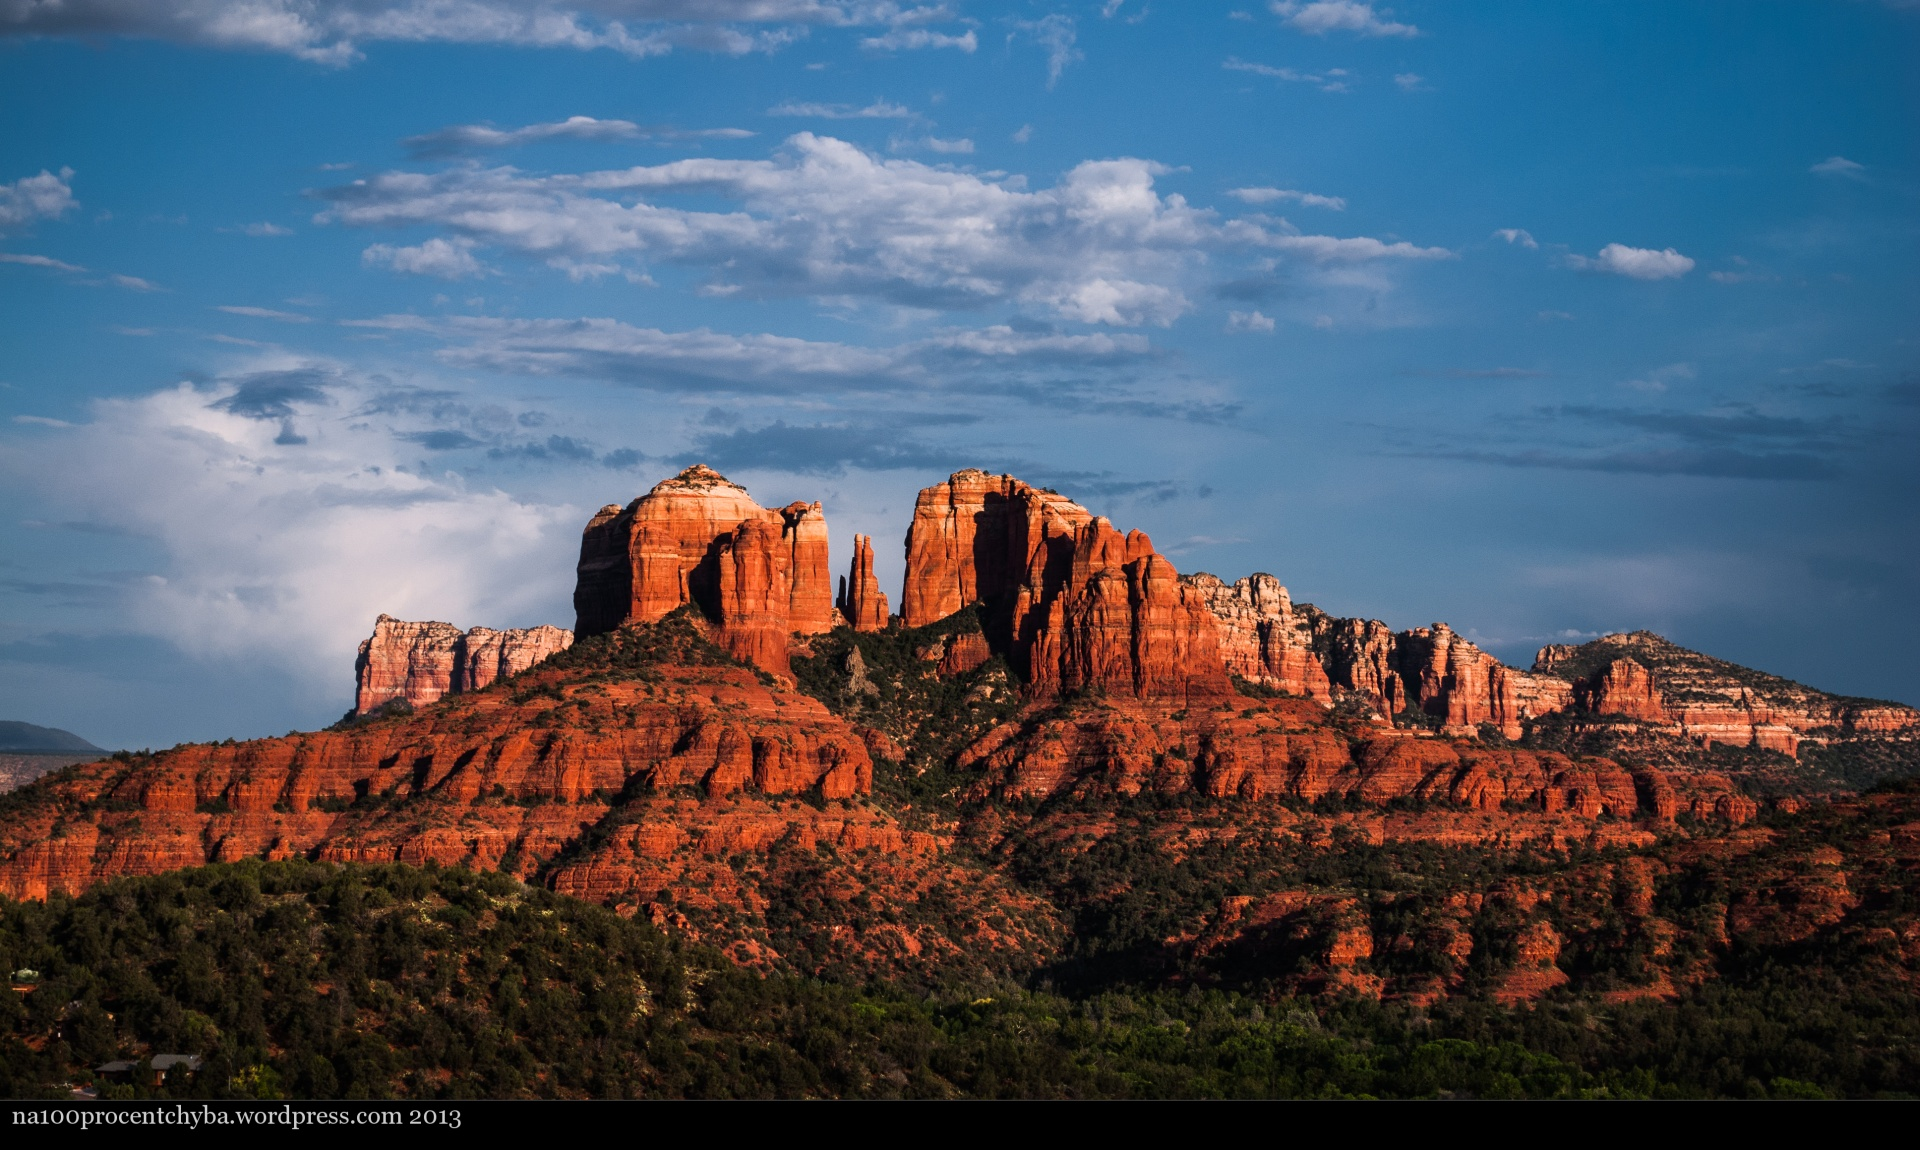 Usa trip 2012 red rock state park near sedona arizona for The sedona